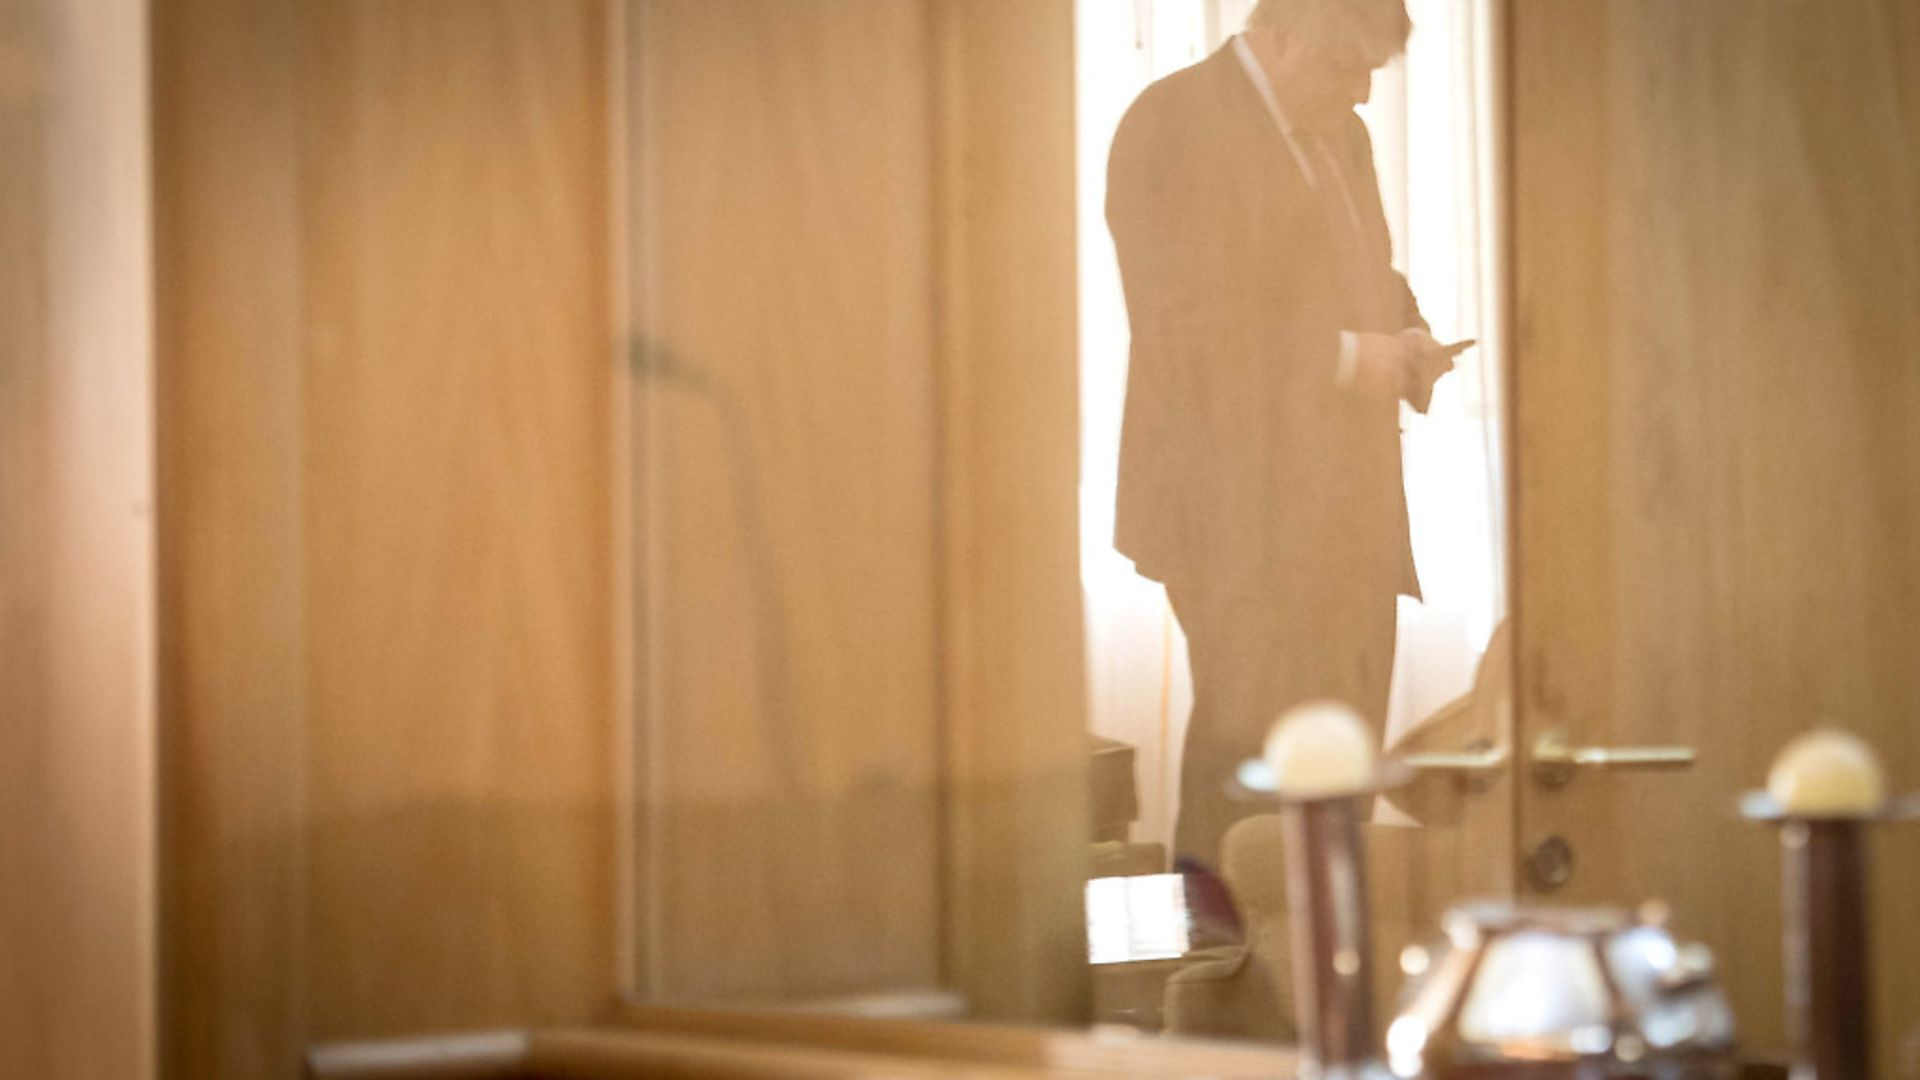 Former foreign secretary Boris Johnson Photo: PA / Stefan Rousseau - Credit: PA Wire/PA Images